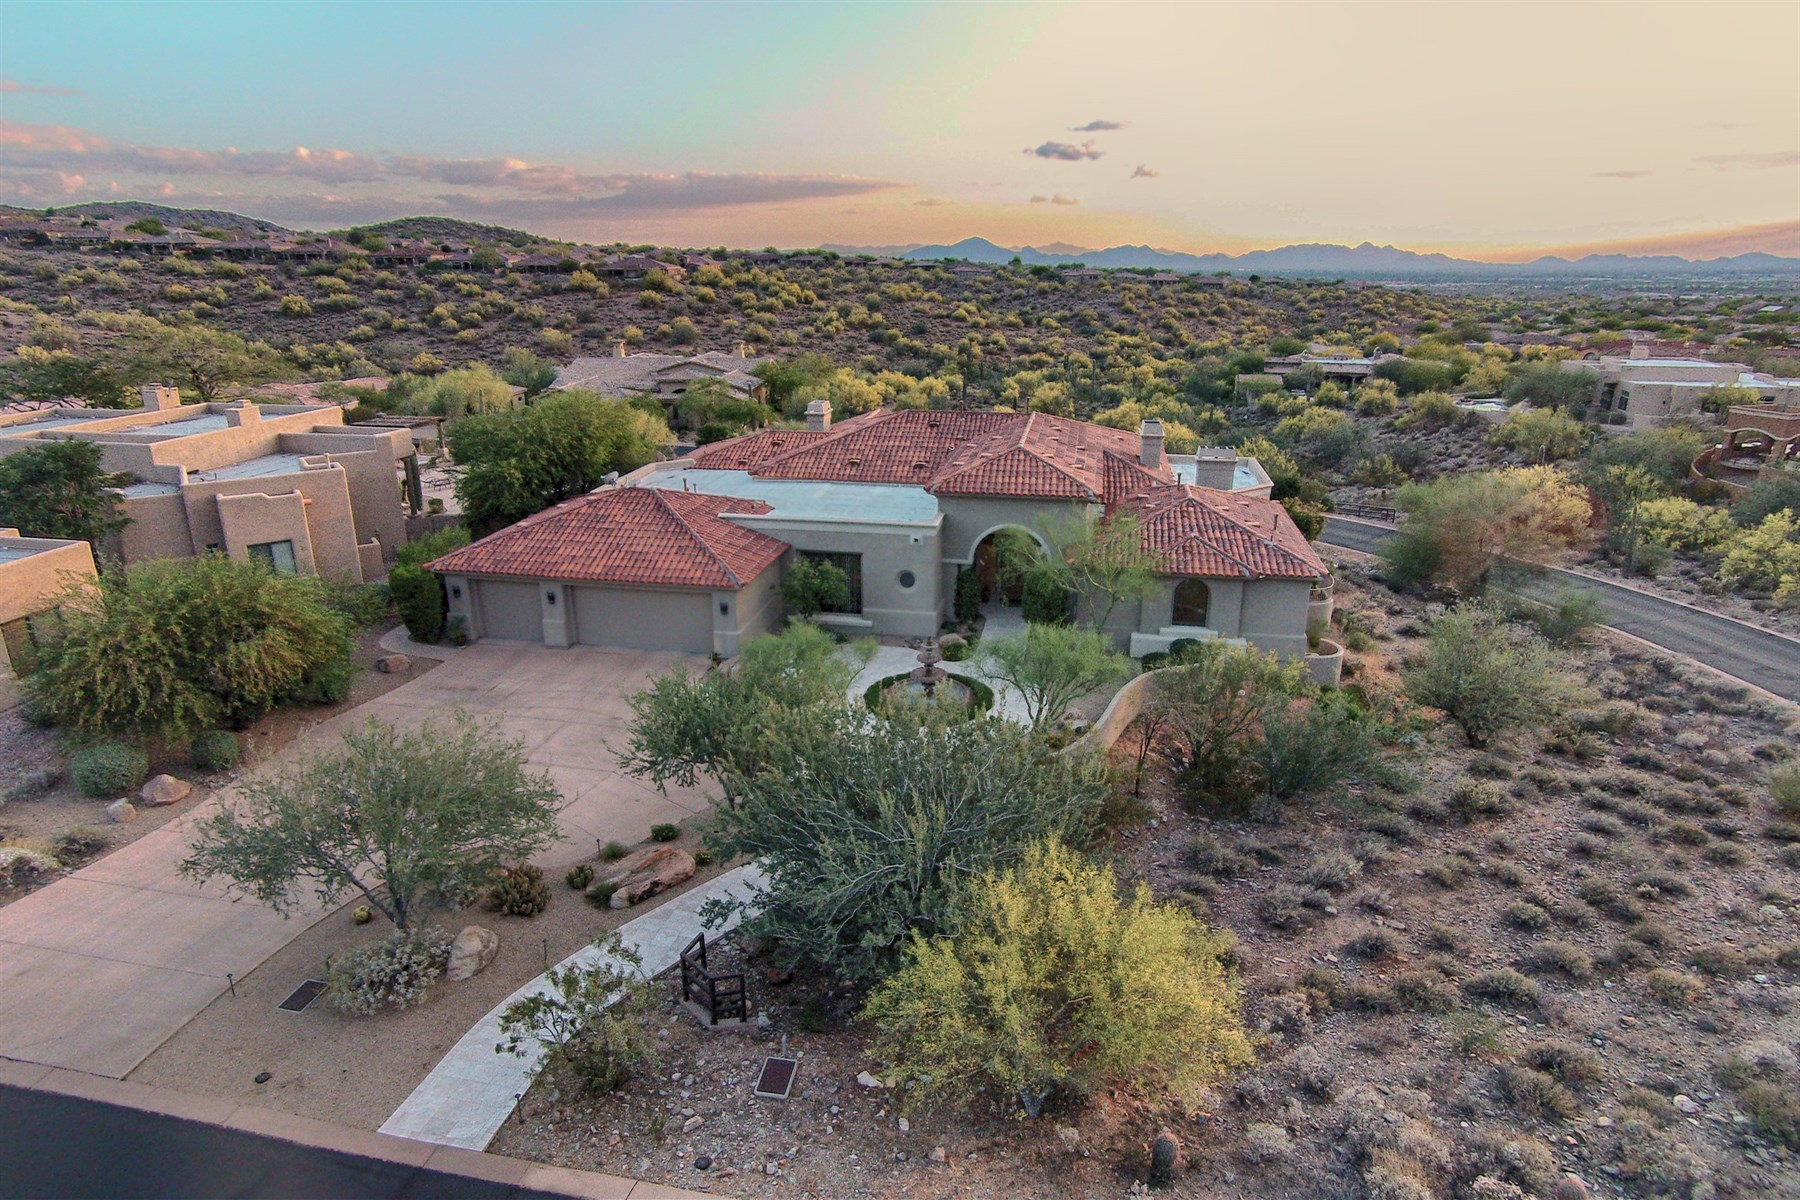 Vivienda unifamiliar por un Venta en Exquisite Mediterranean style home nestled in a secluded canyon. 11397 E BETONY DR Scottsdale, Arizona, 85255 Estados Unidos